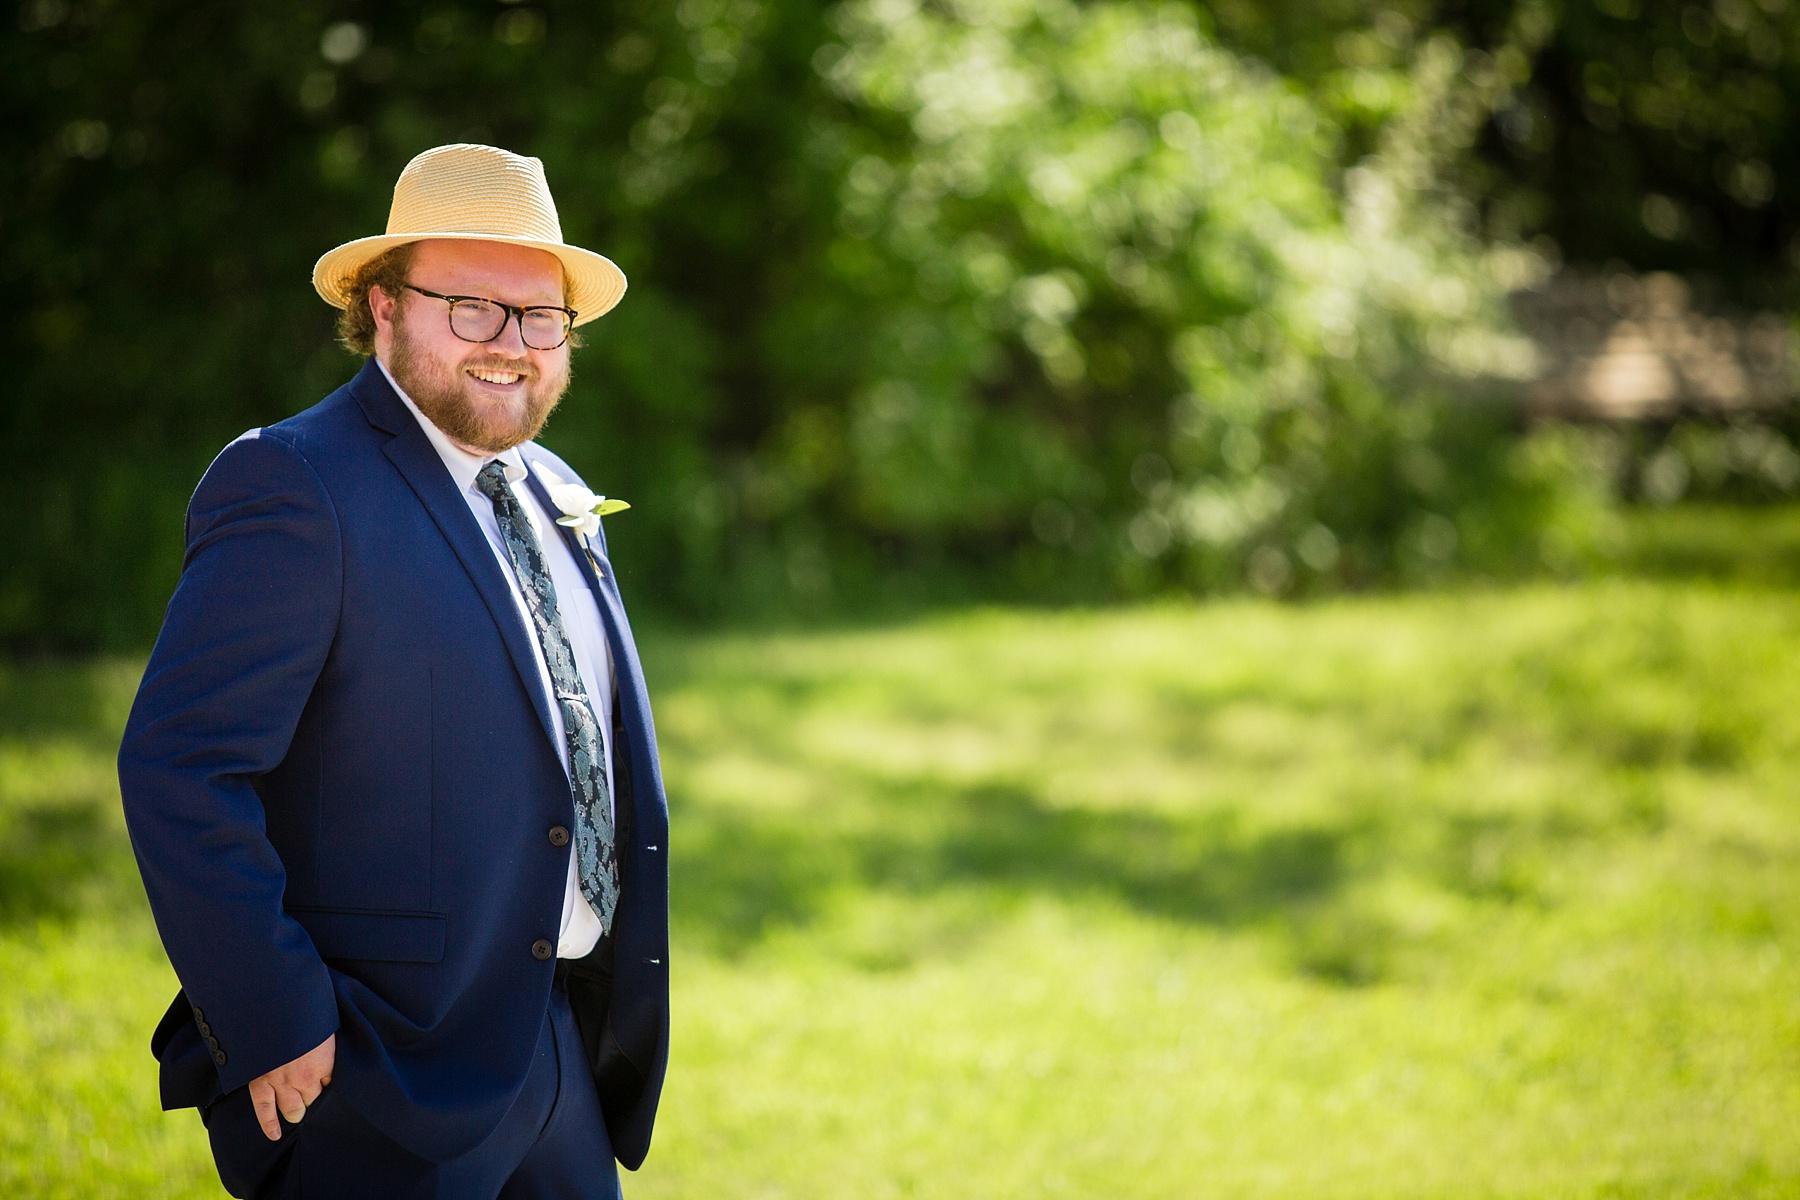 Brandon_Shafer_Photography_Kara_Doug_12_corners_Wedding_Benton_Harbor_0035.jpg